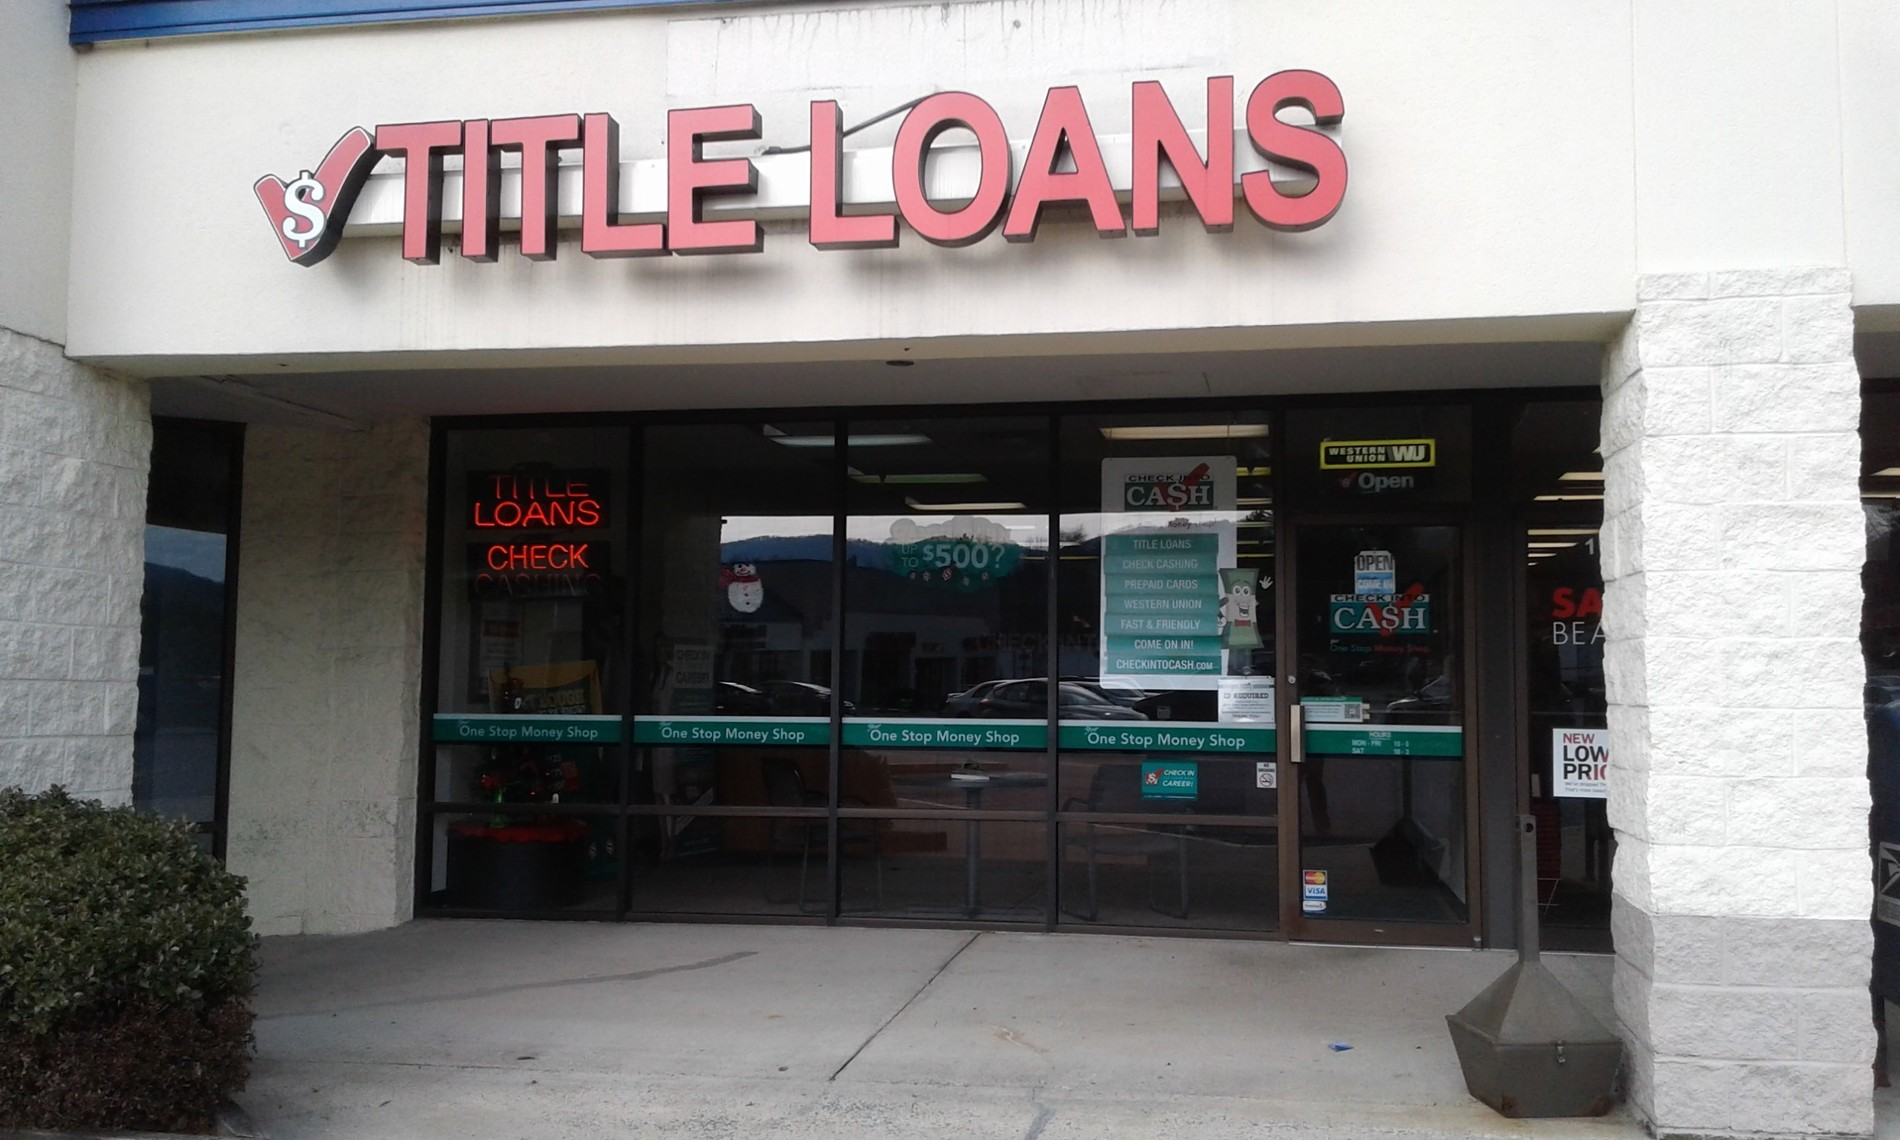 Cash loan company photo 6